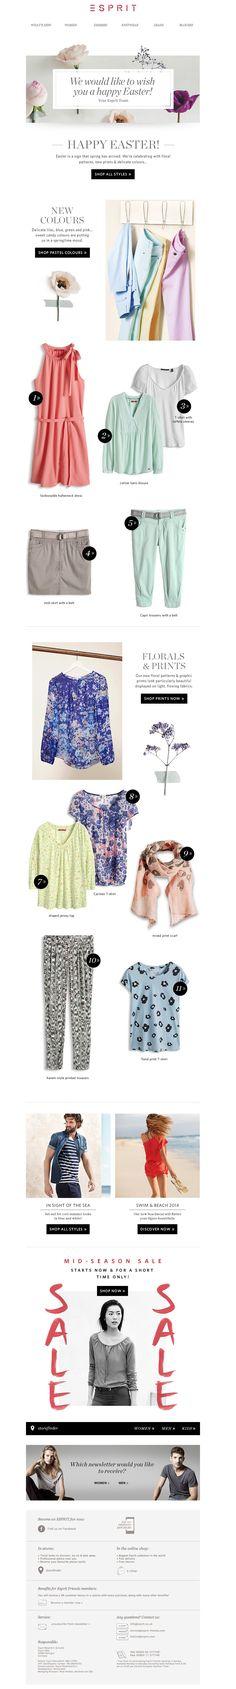 #newsletter Esprit 04.2014 The mid-season SALE starts now || Floral prints & delicate colours!